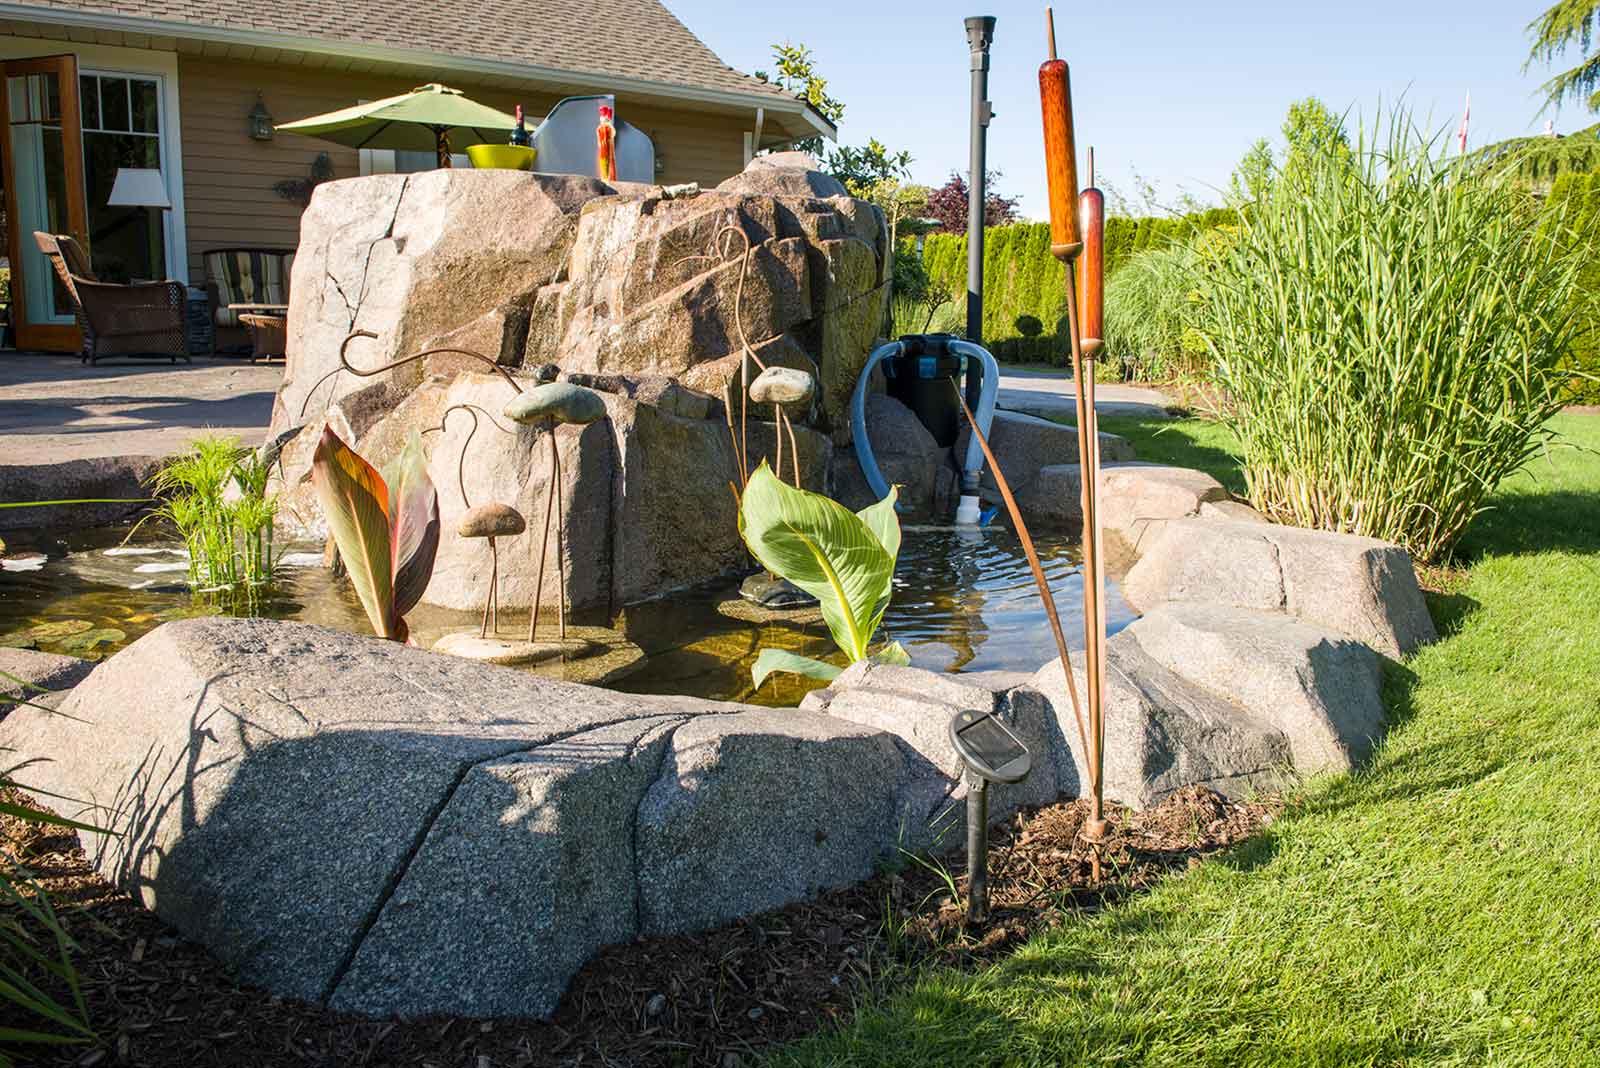 Outdoor custom garden pond with artificial rock wall